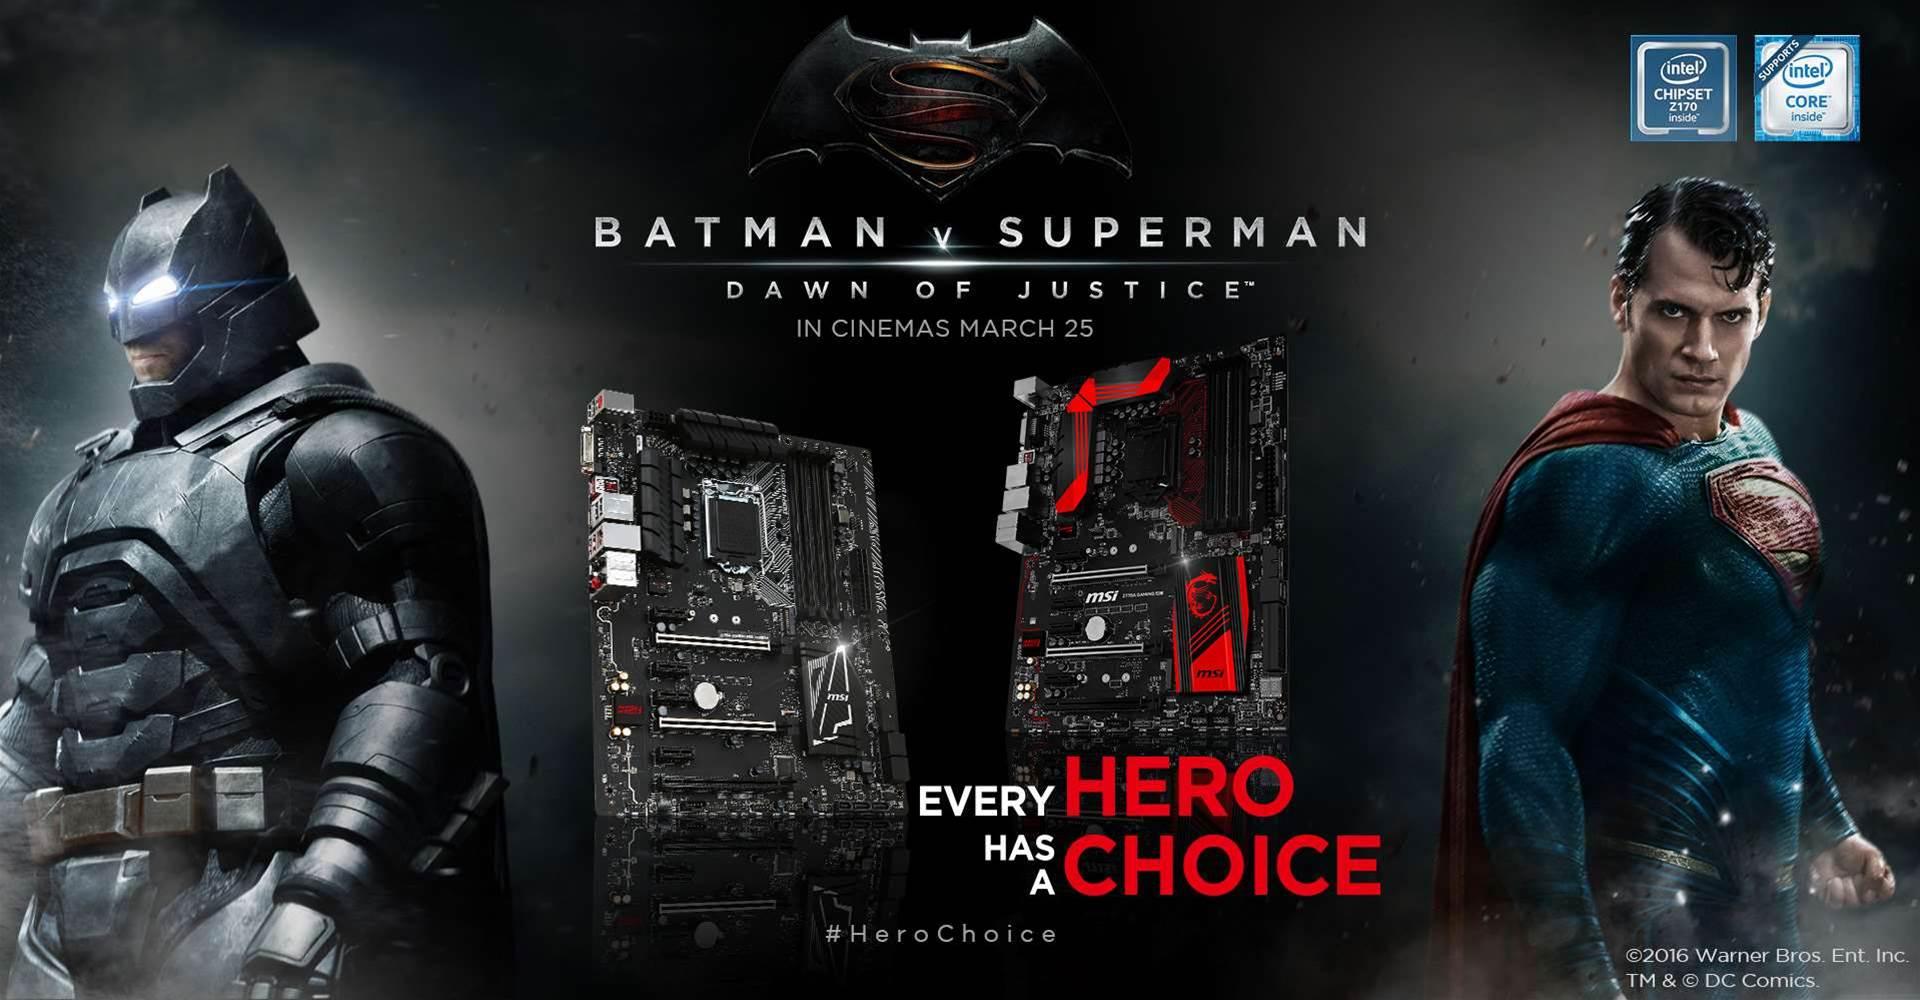 MSI partners with Warner Bros for Batman v Superman tie-in